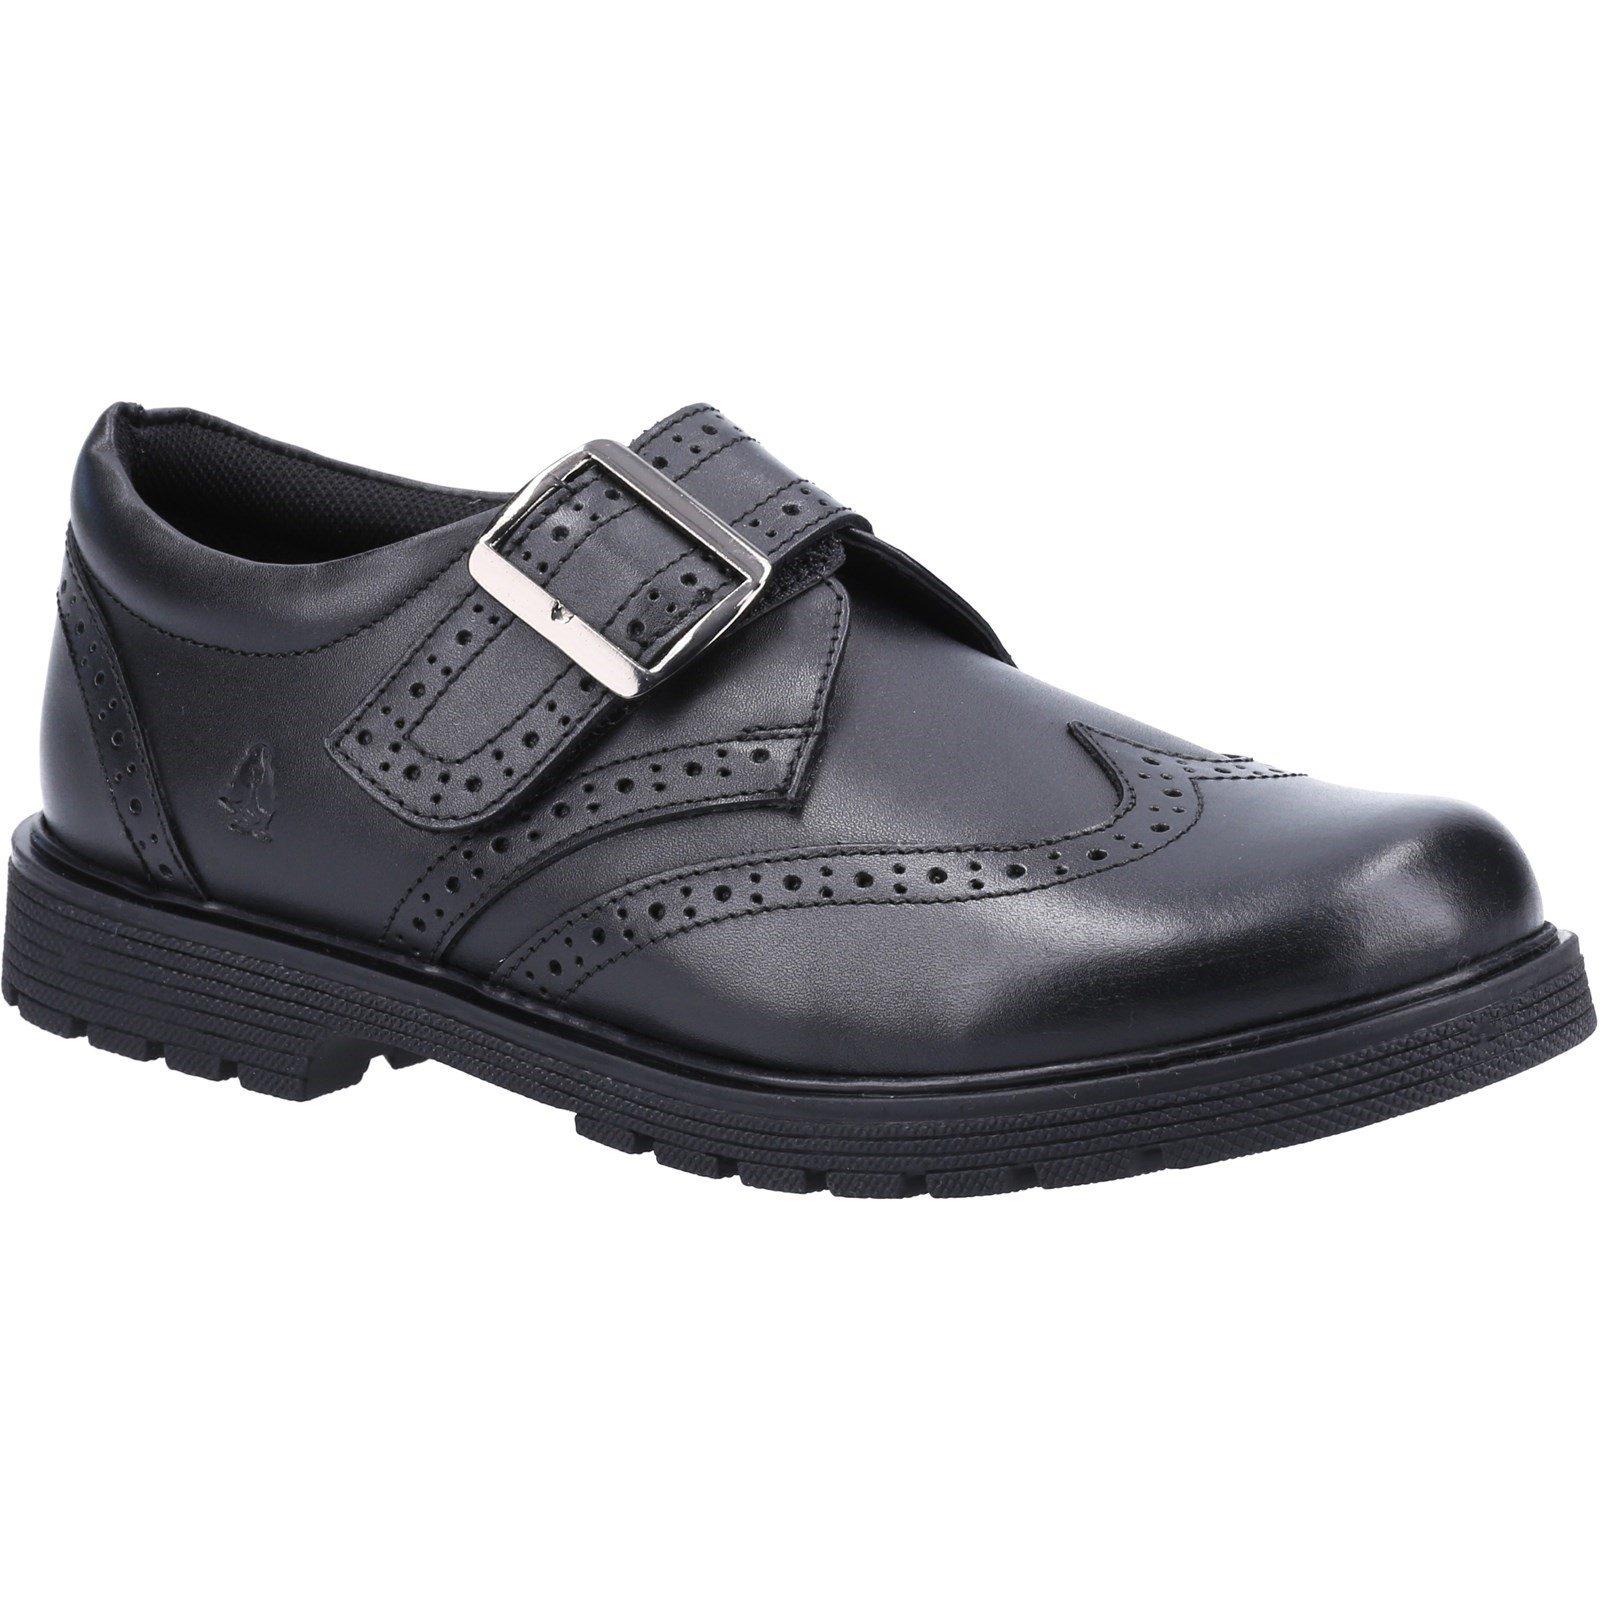 Hush Puppies Kid's Rhiannon Senior School Shoe Black 32626-55768 - Black 3